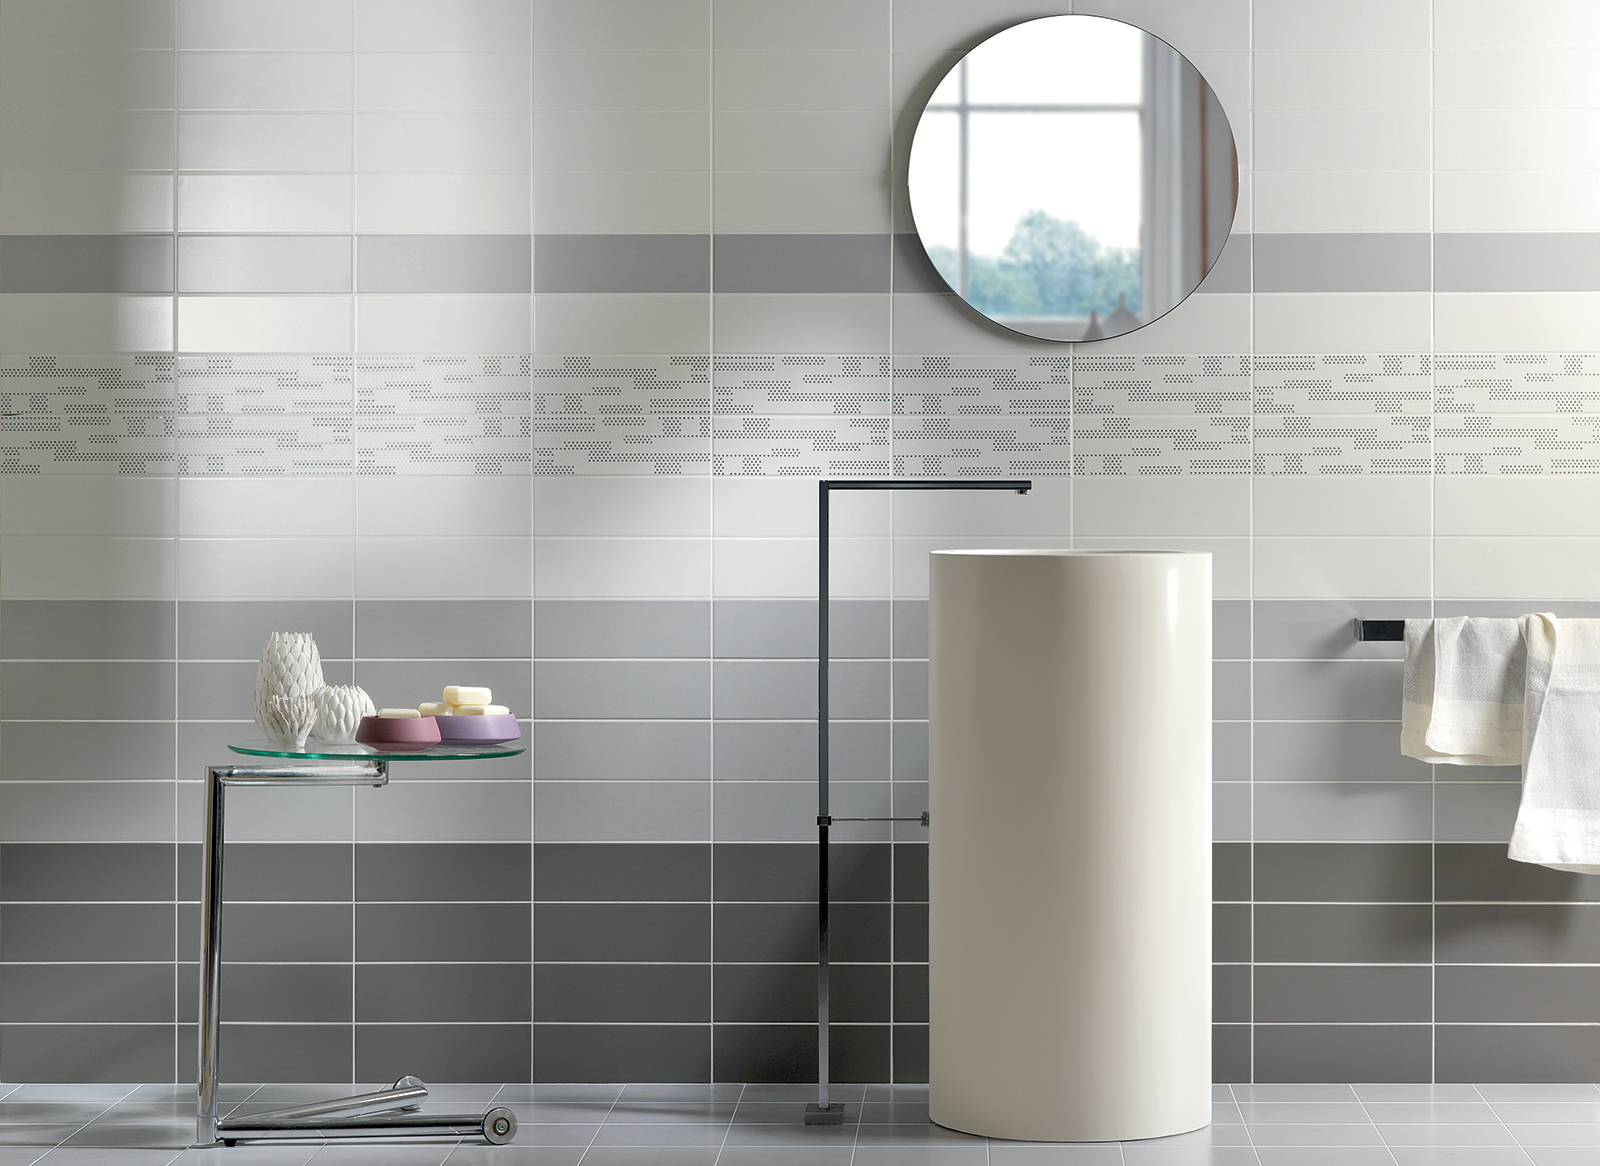 Tiffany rivestimento bagno grigio cemento wall moda ceramica - Rivestimento bagno grigio ...